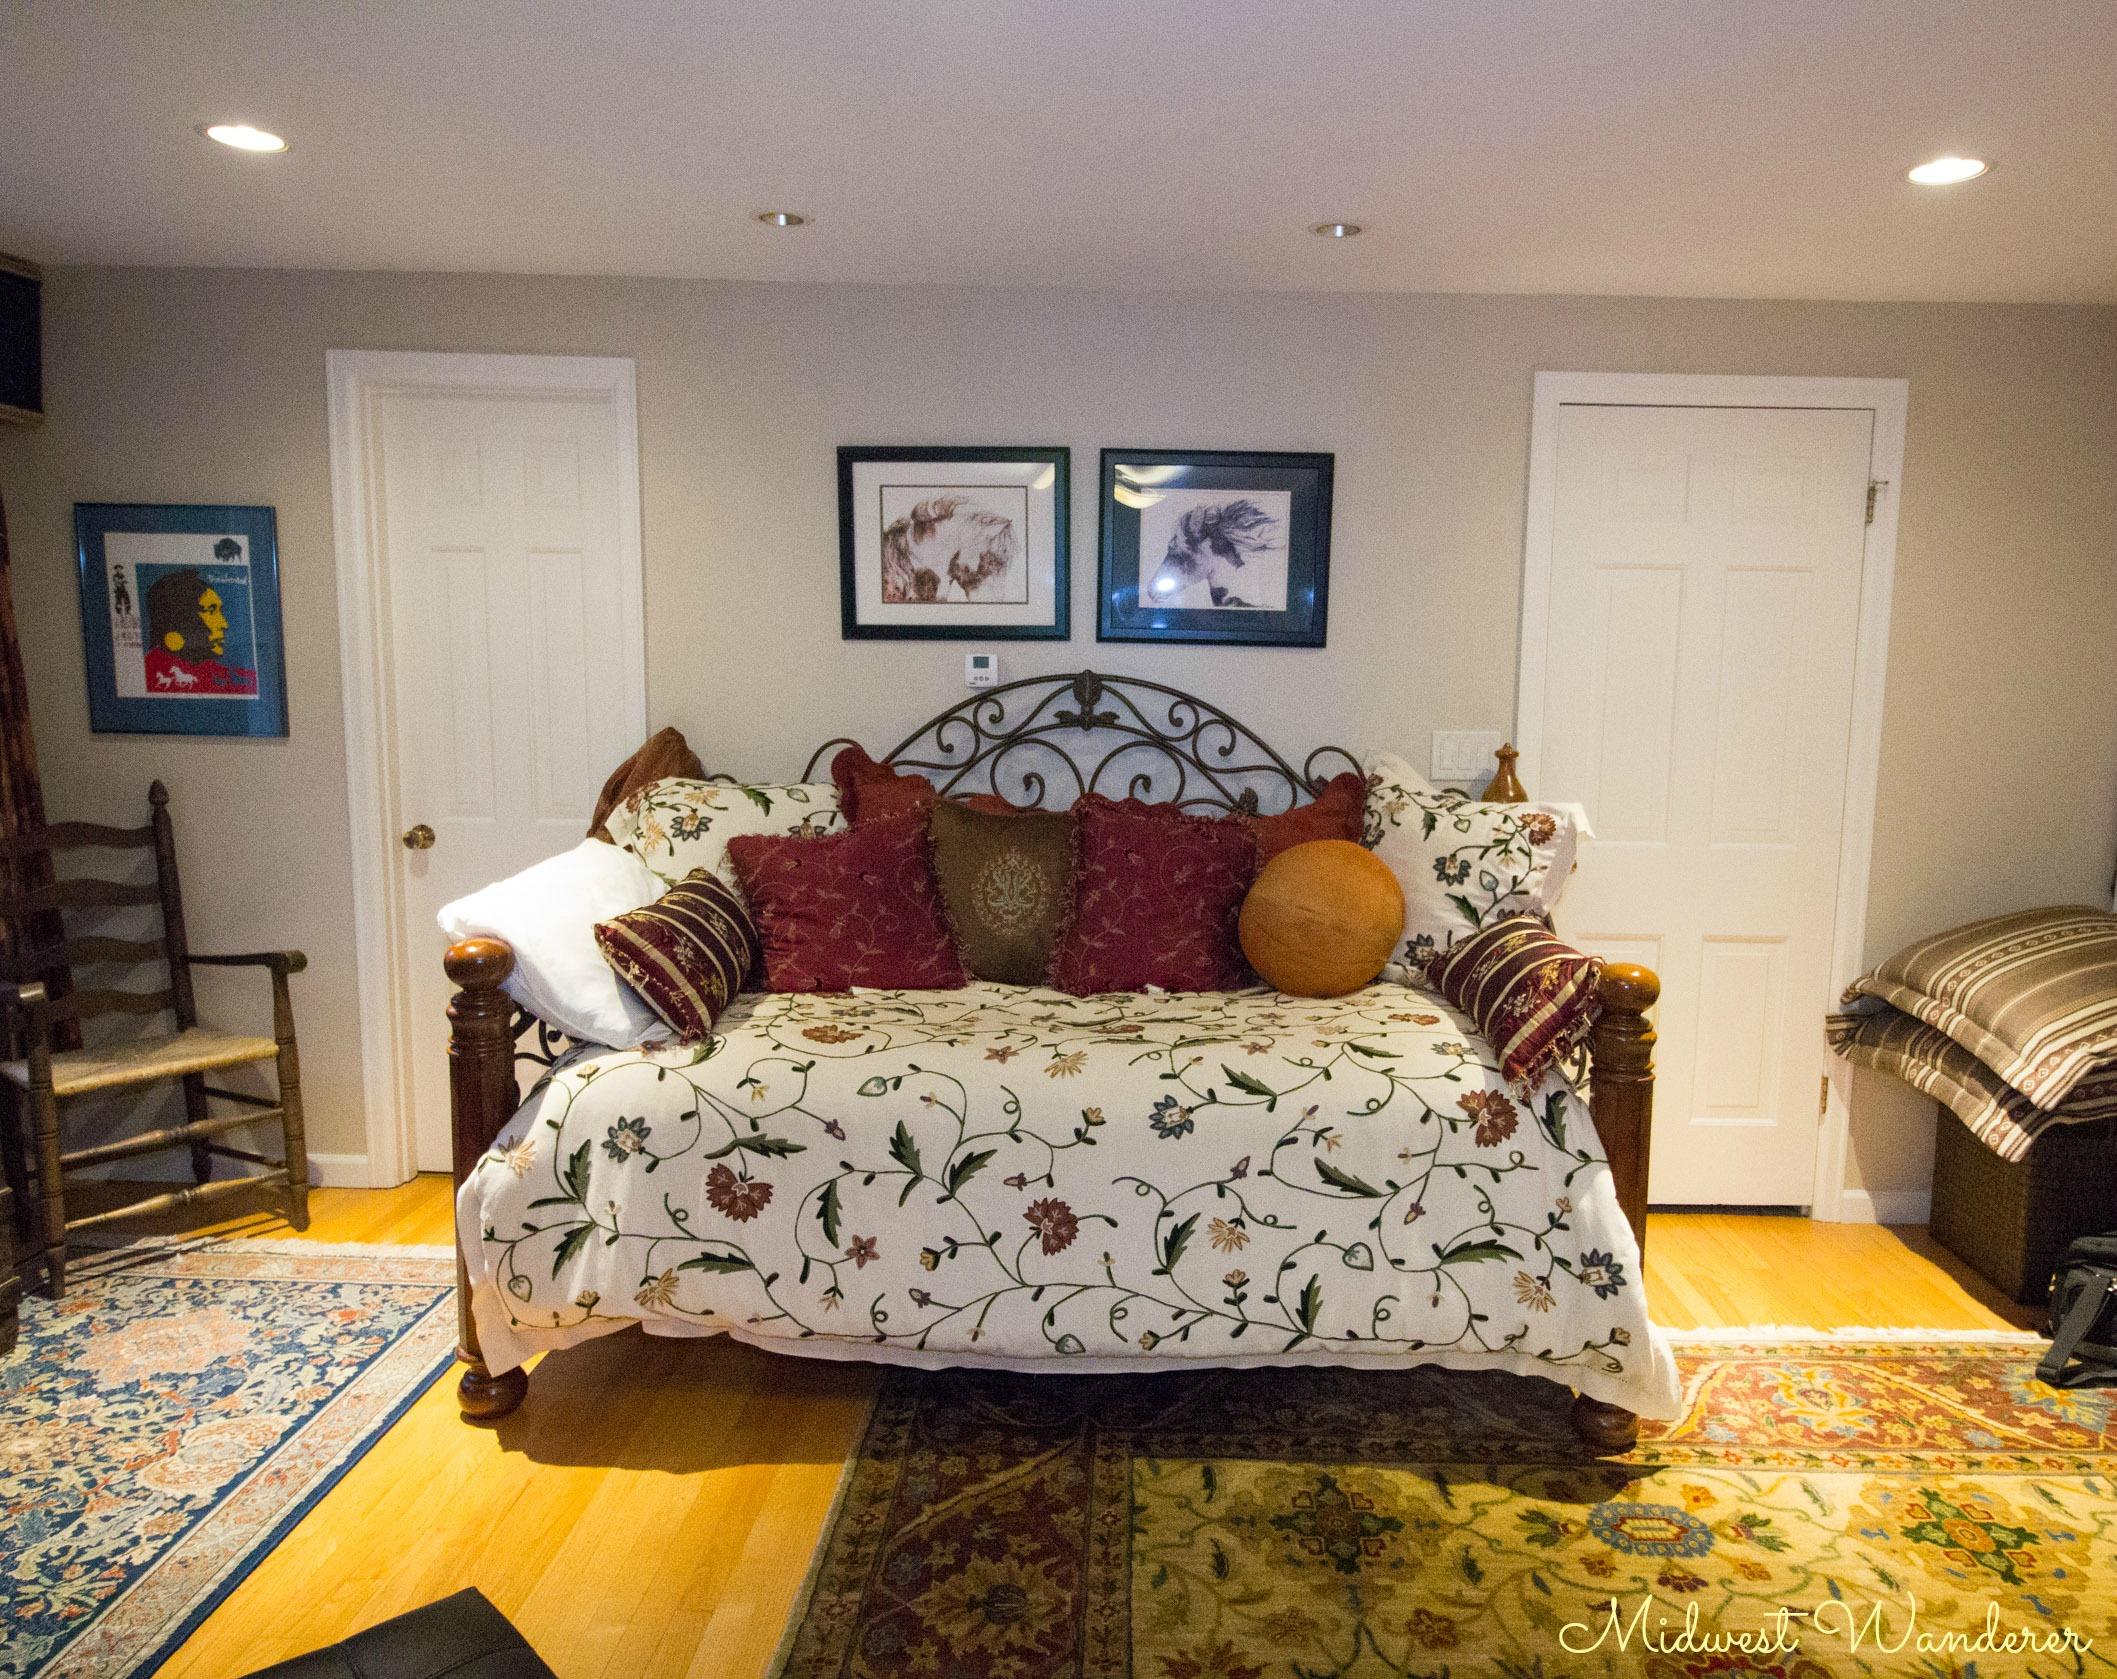 Seldom Scene Meadow Western Room daybed